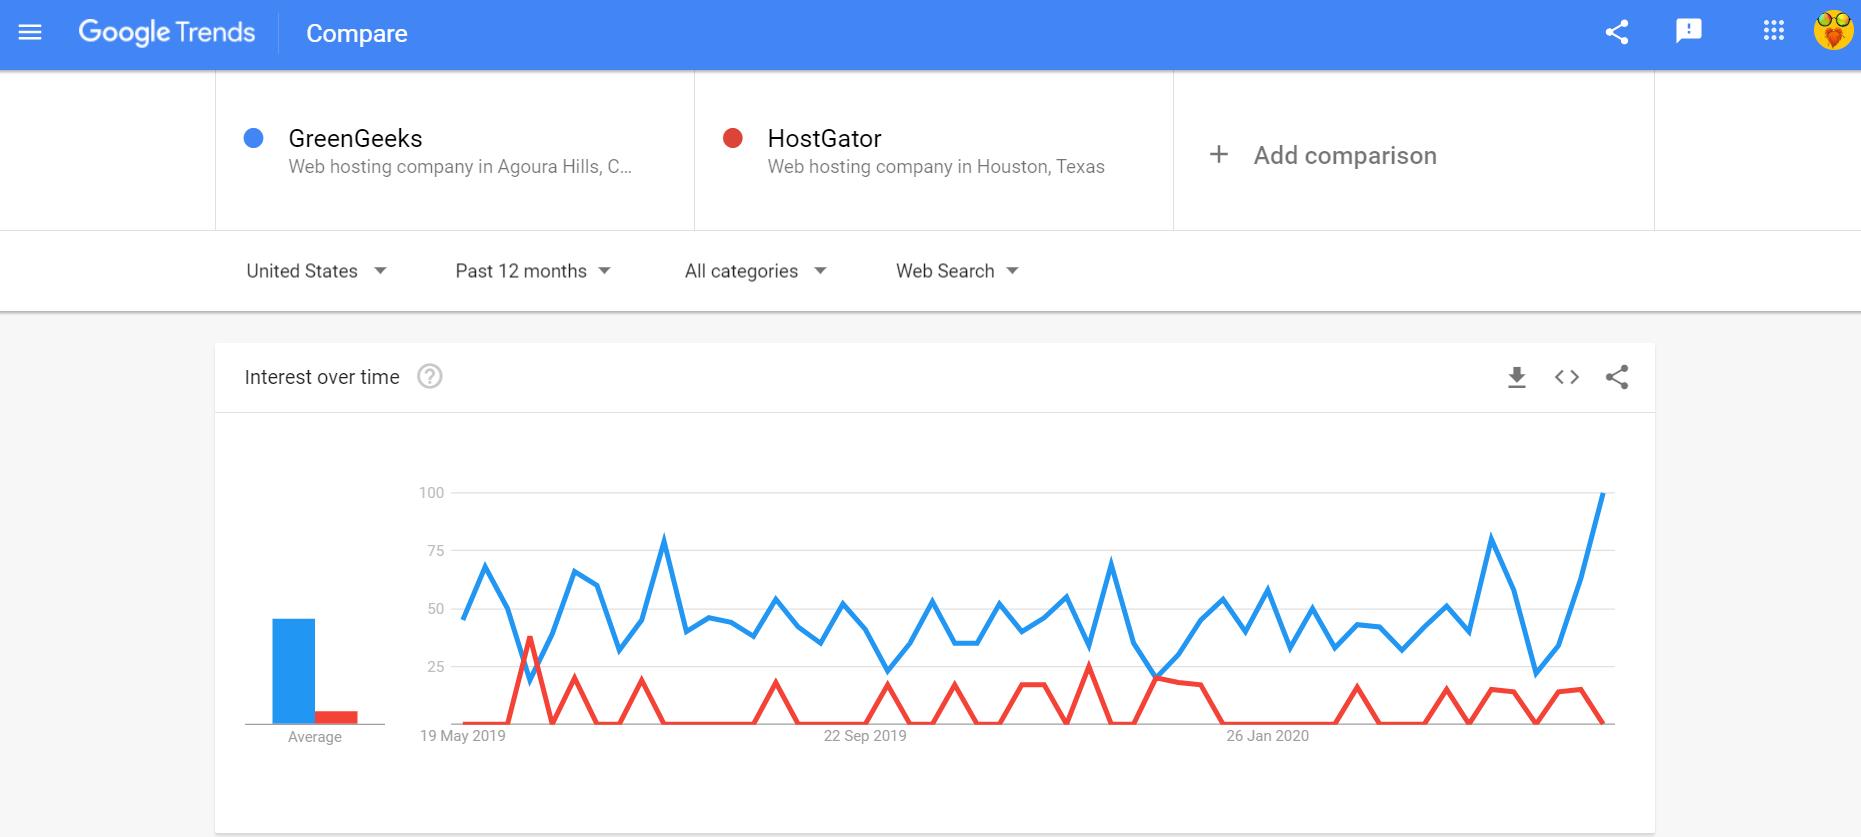 google trends GreenGeeks vs HostGator